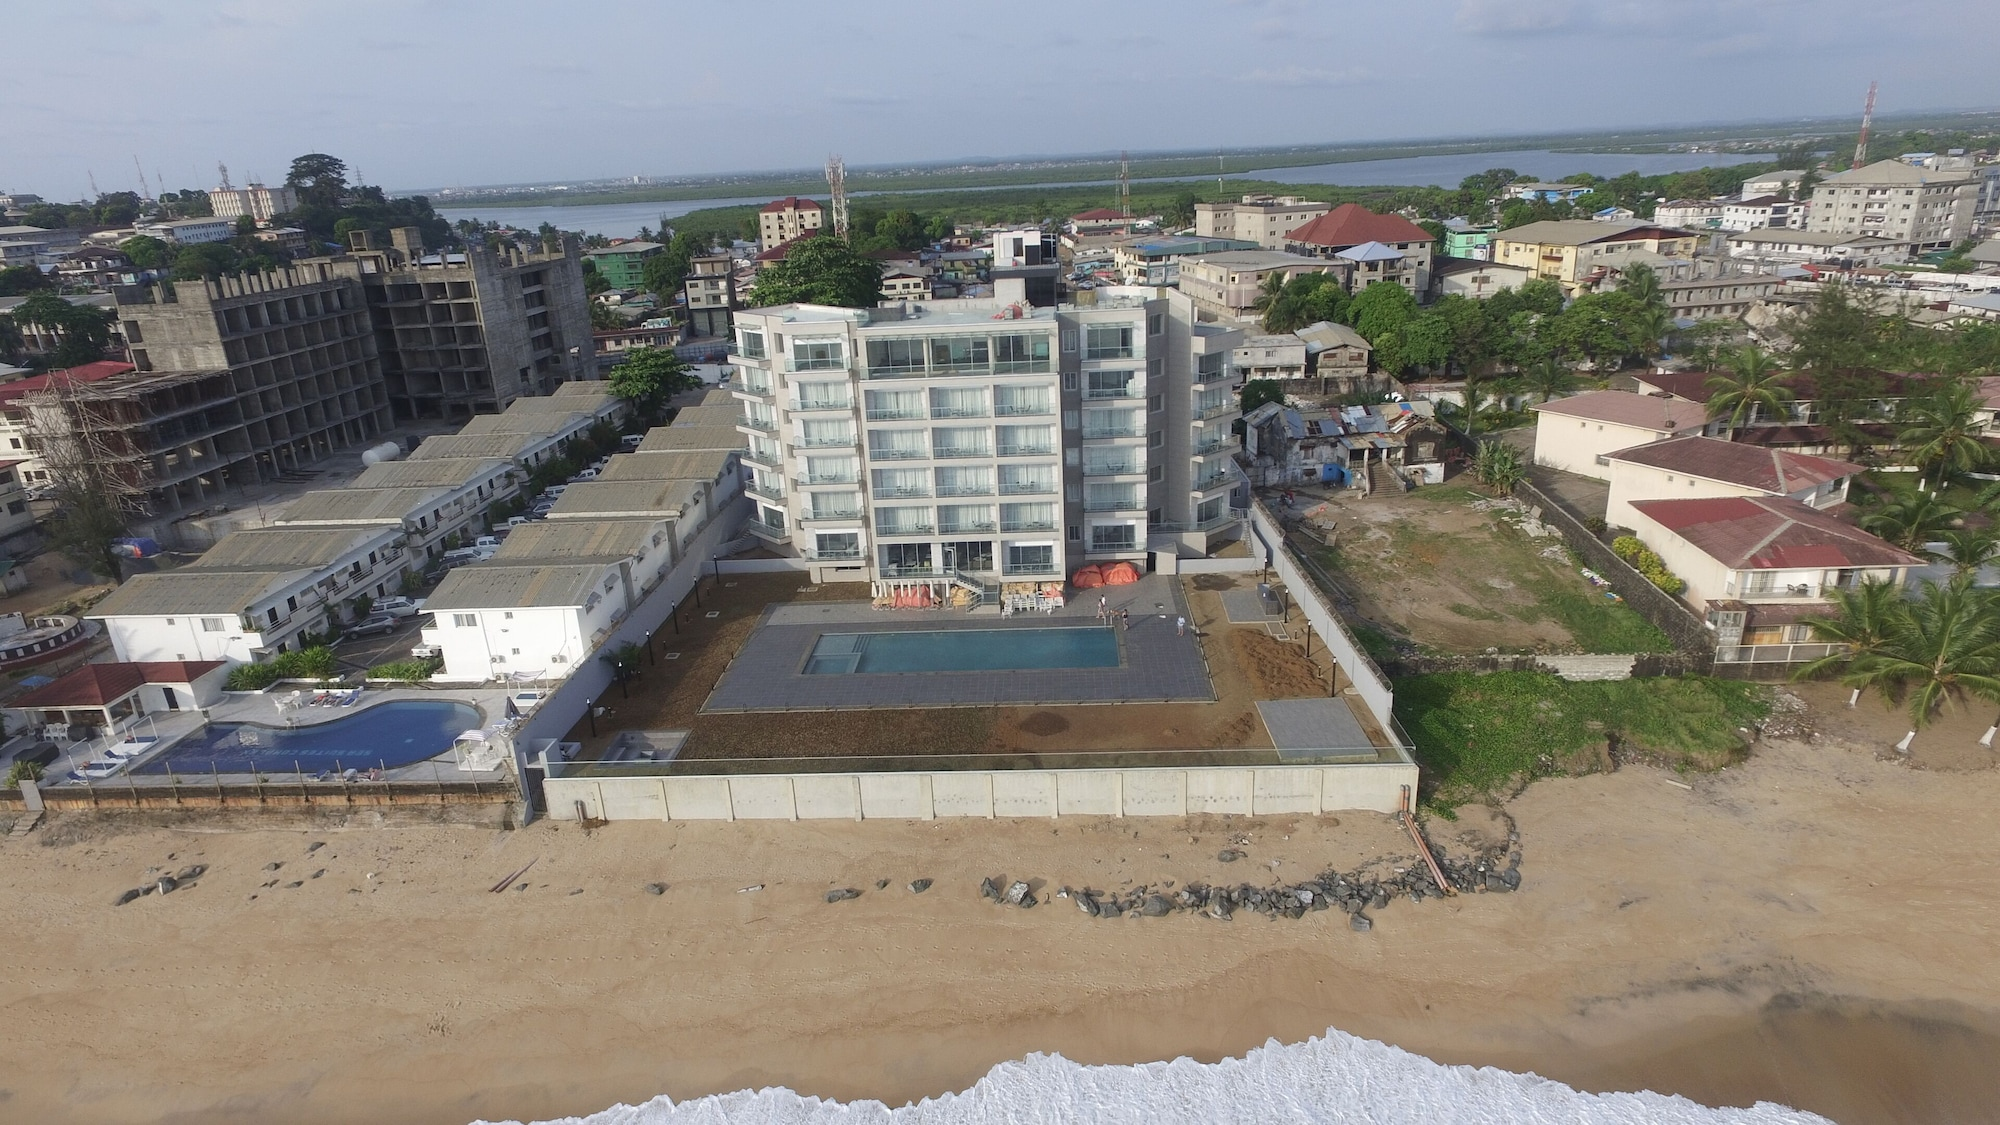 Waves Luxury Apartments, Greater Monrovia